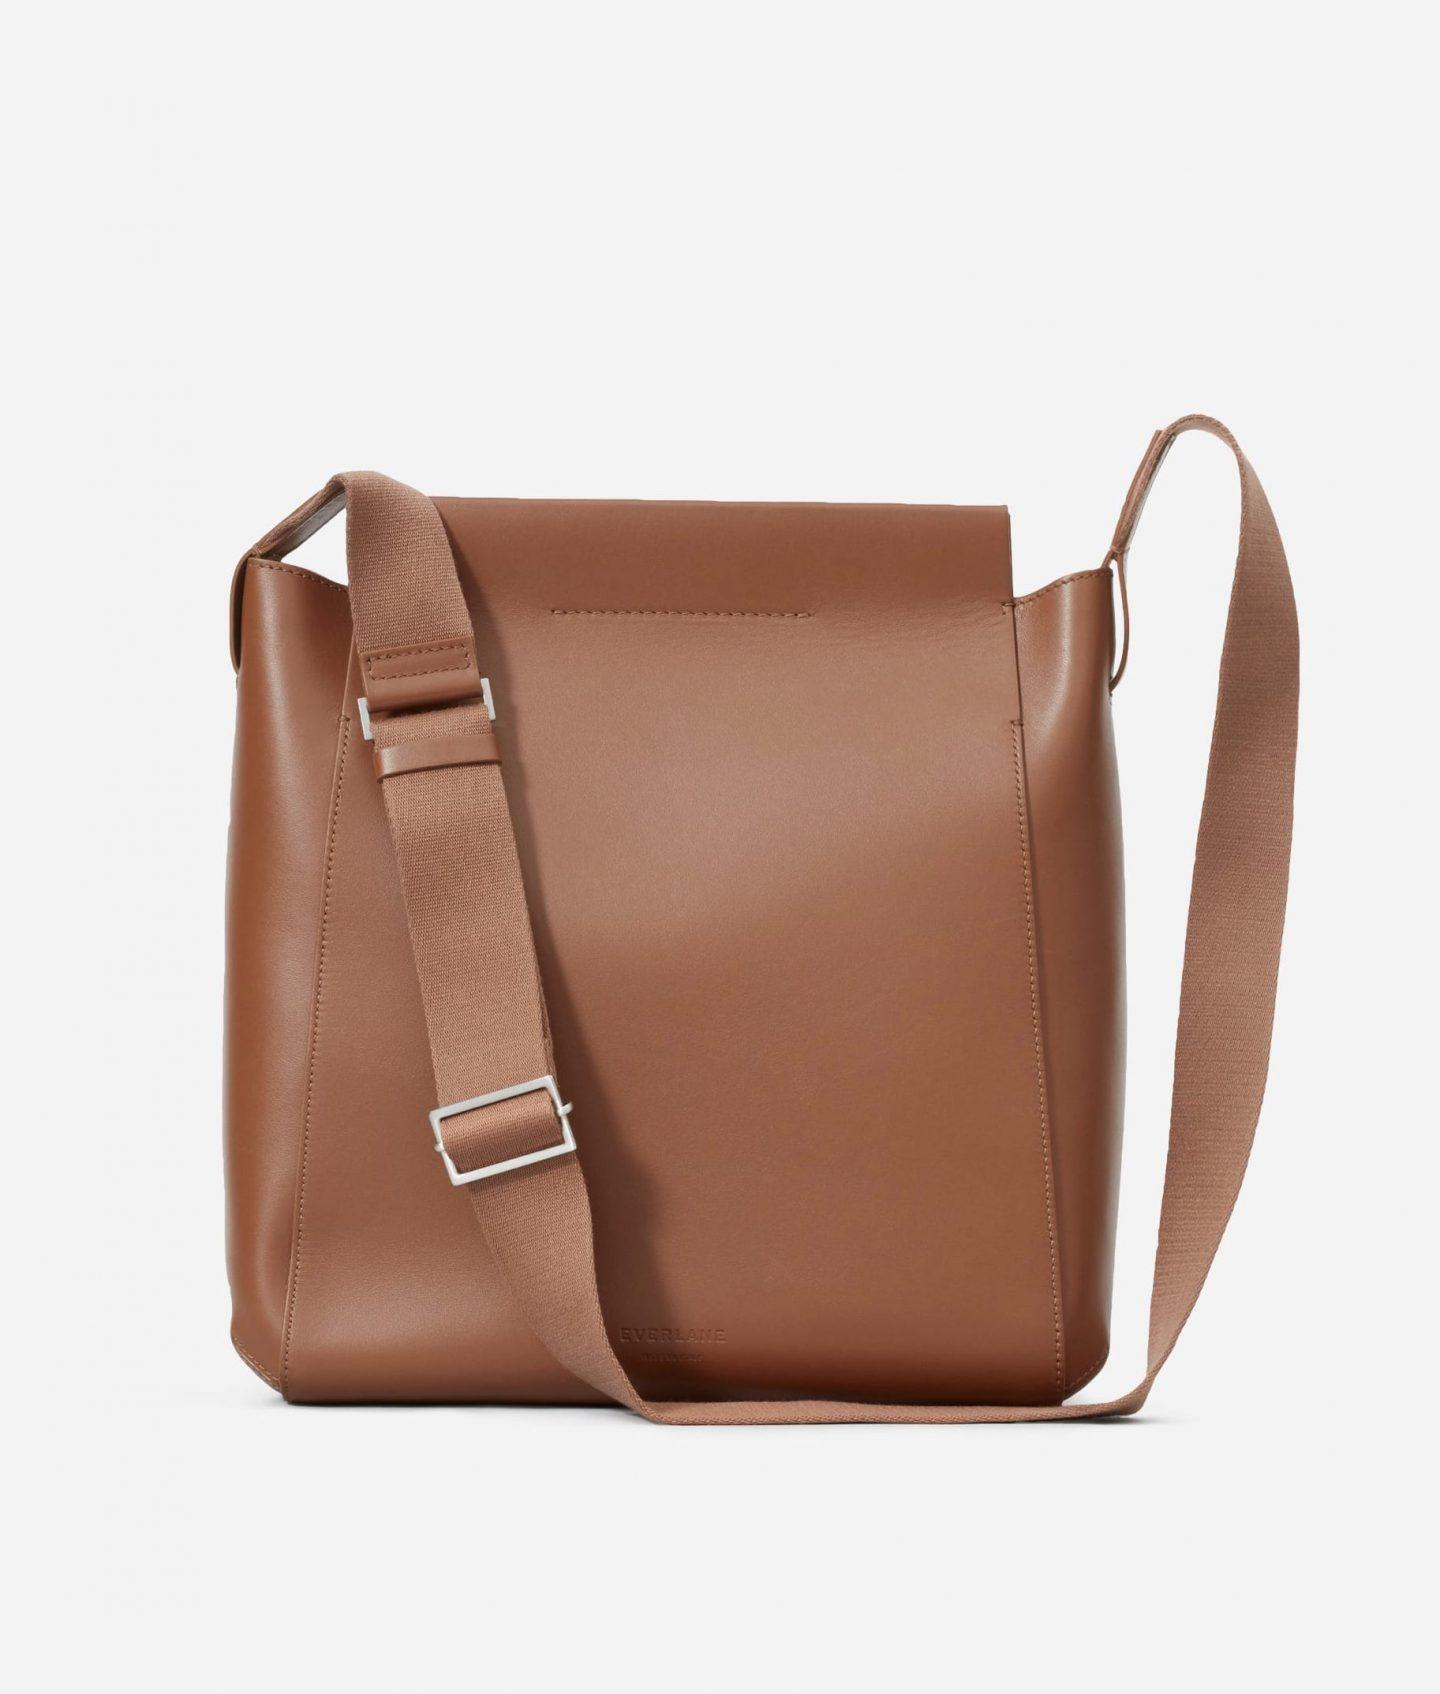 Camel colored minimalist crossbody bag from Everlane